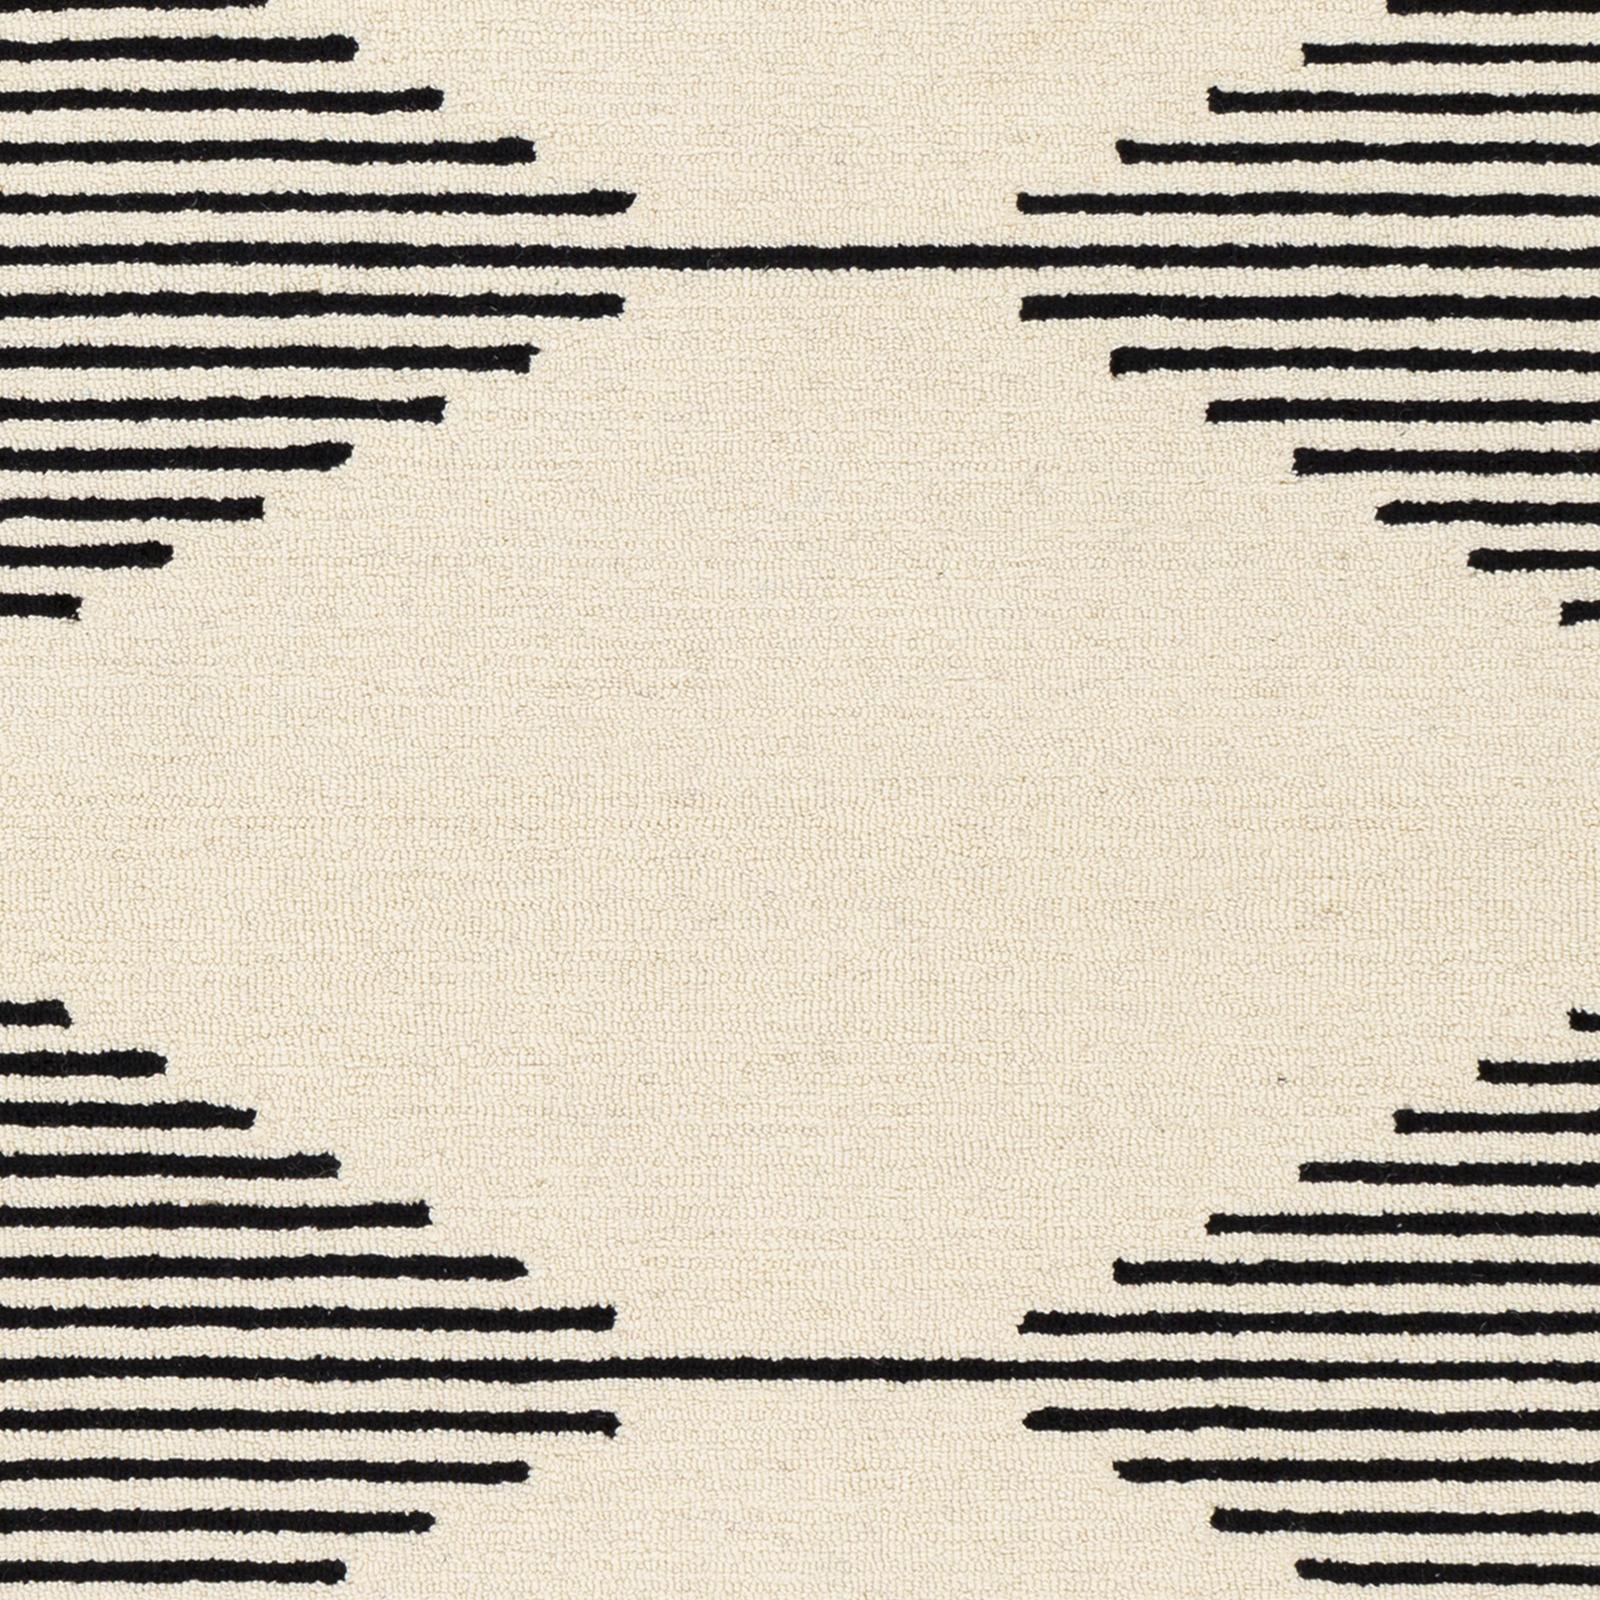 Granada - GND-2331 - 2' x 3'